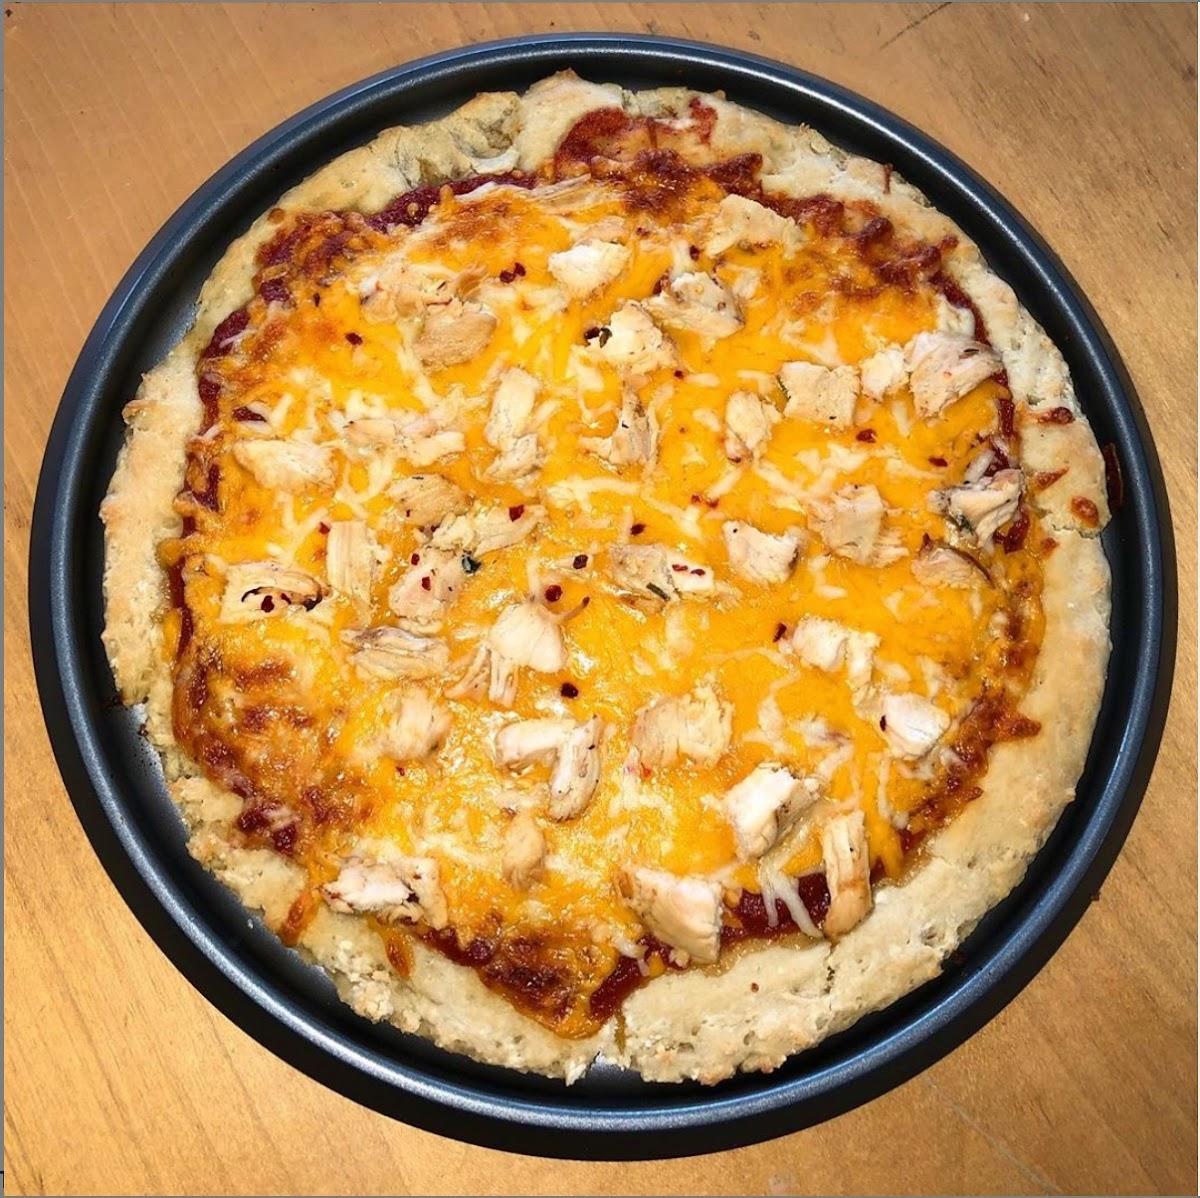 Pizza Crust Making Kit